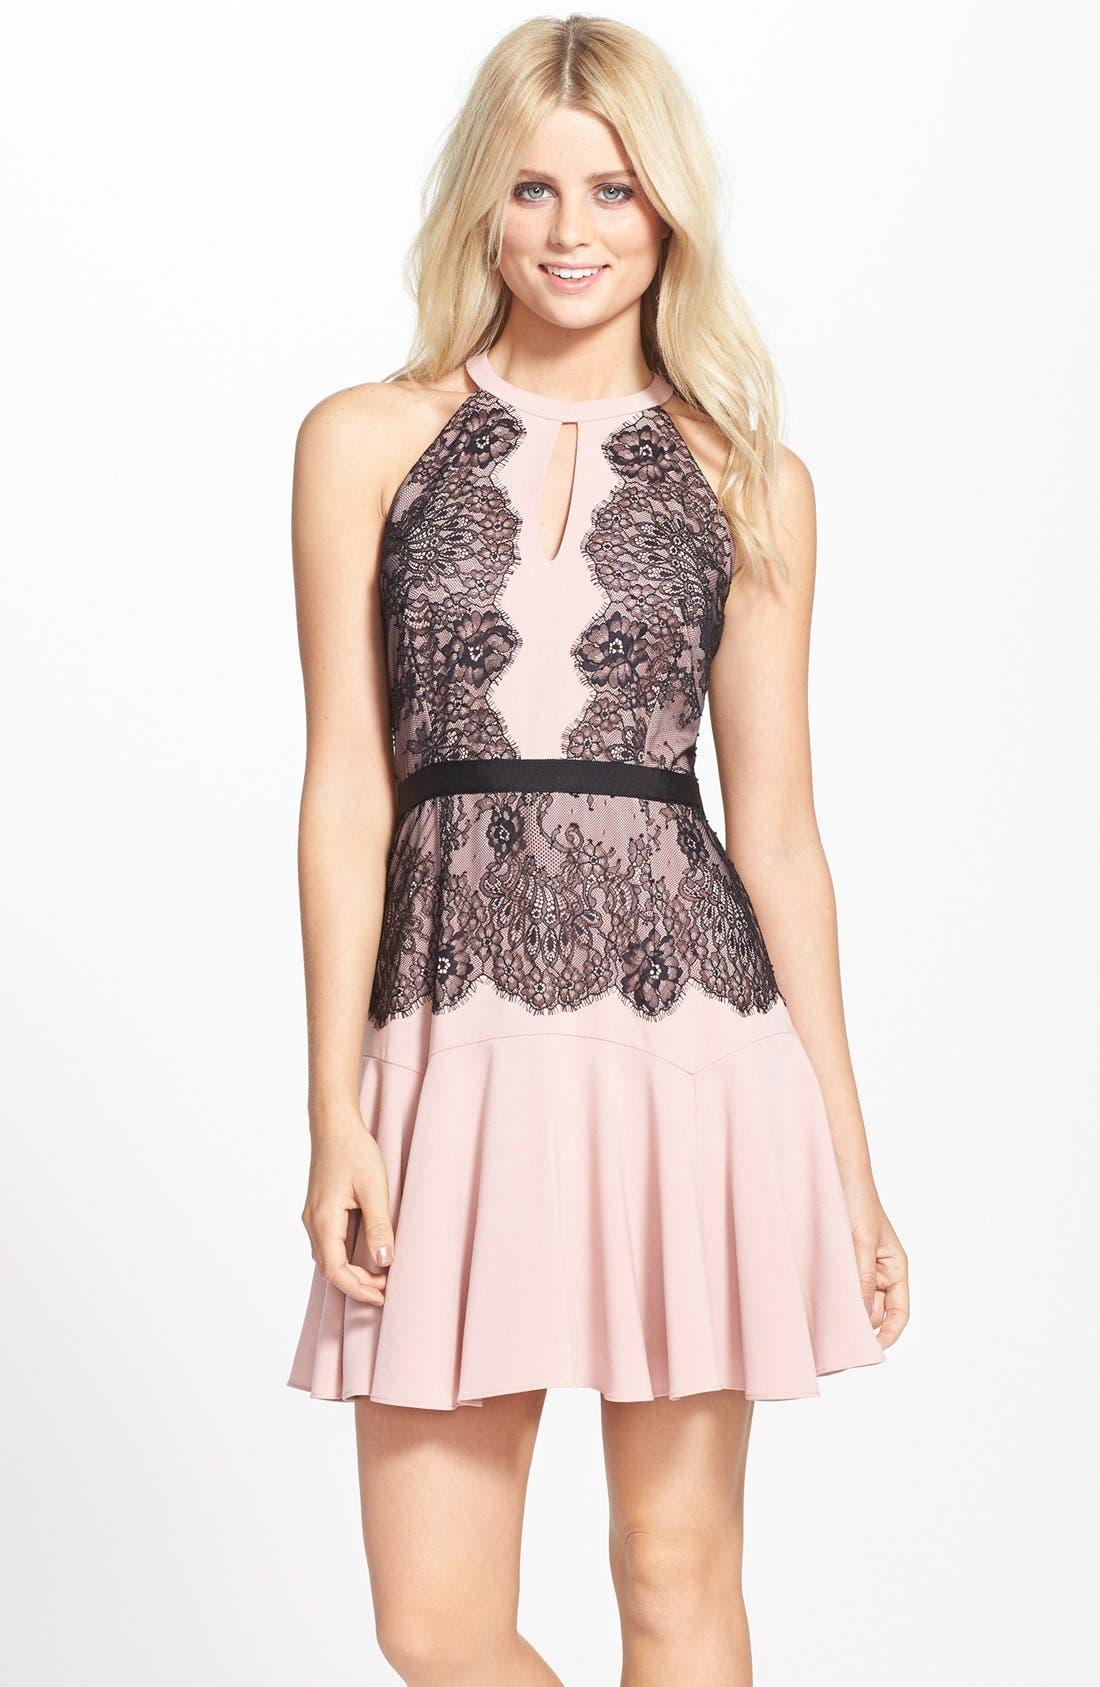 Alternate Image 1 Selected - BCBGMAXAZRIA 'Leyla' Fit & Flare Halter Dress